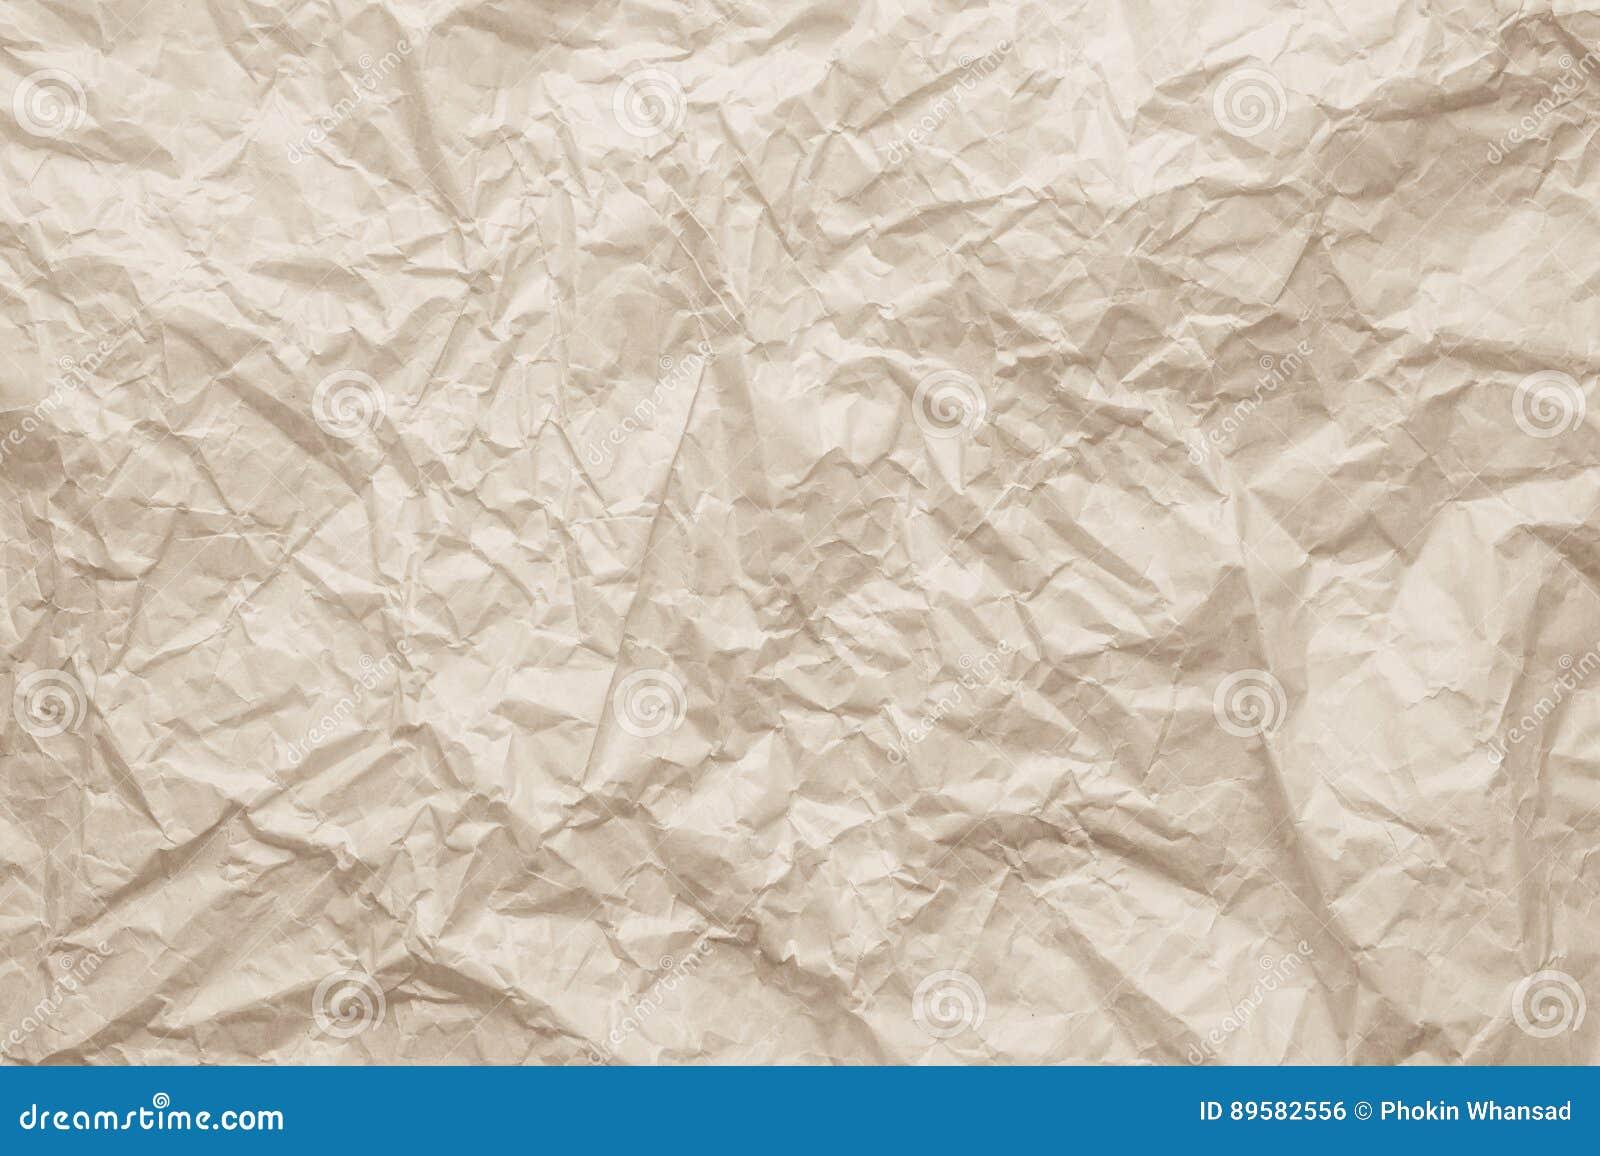 Textura De Papel Reciclada Natural Papel En Blanco De La